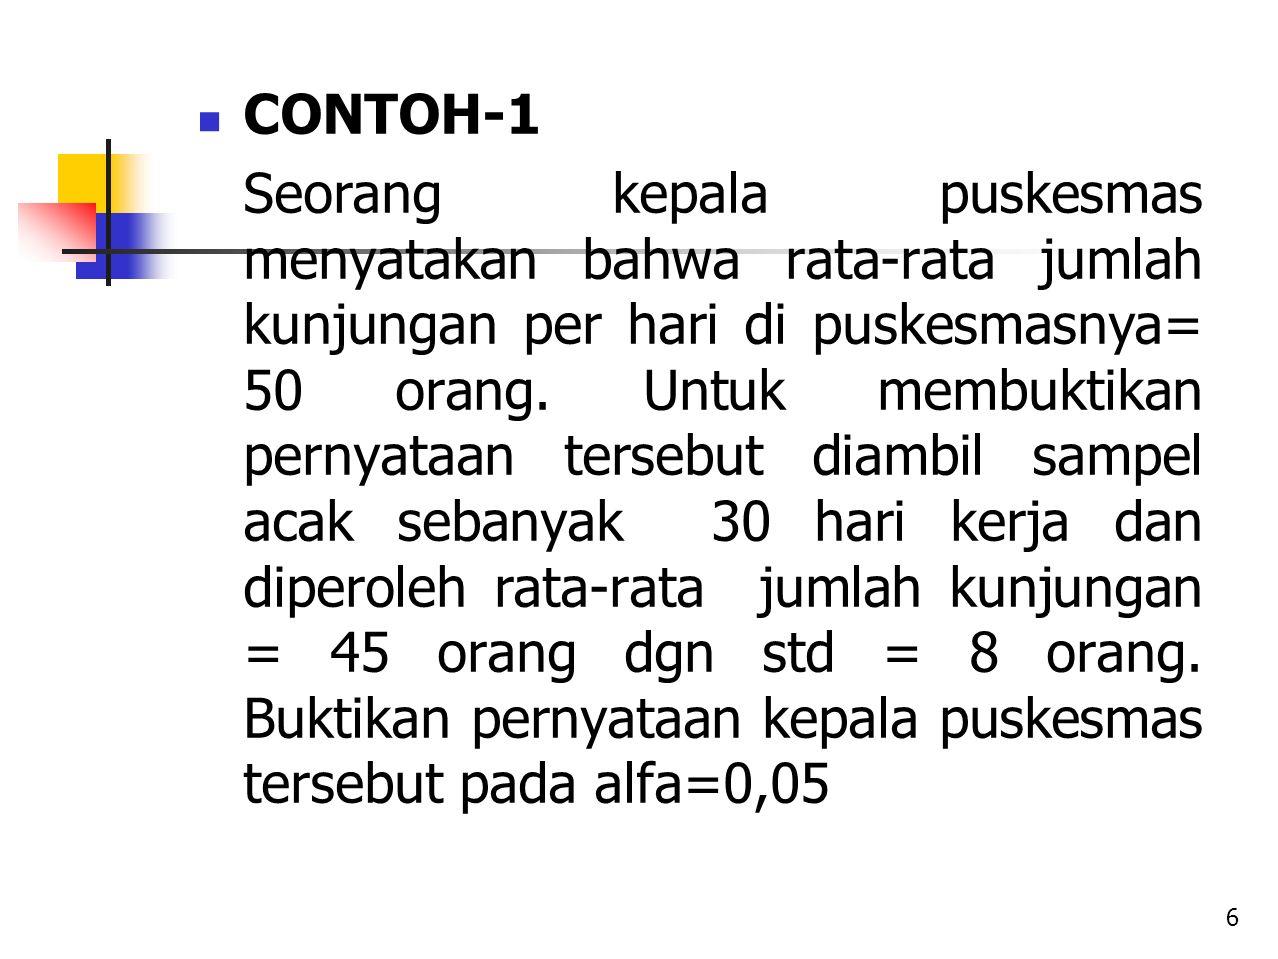 CONTOH-1 Seorang kepala puskesmas menyatakan bahwa rata-rata jumlah kunjungan per hari di puskesmasnya= 50 orang.